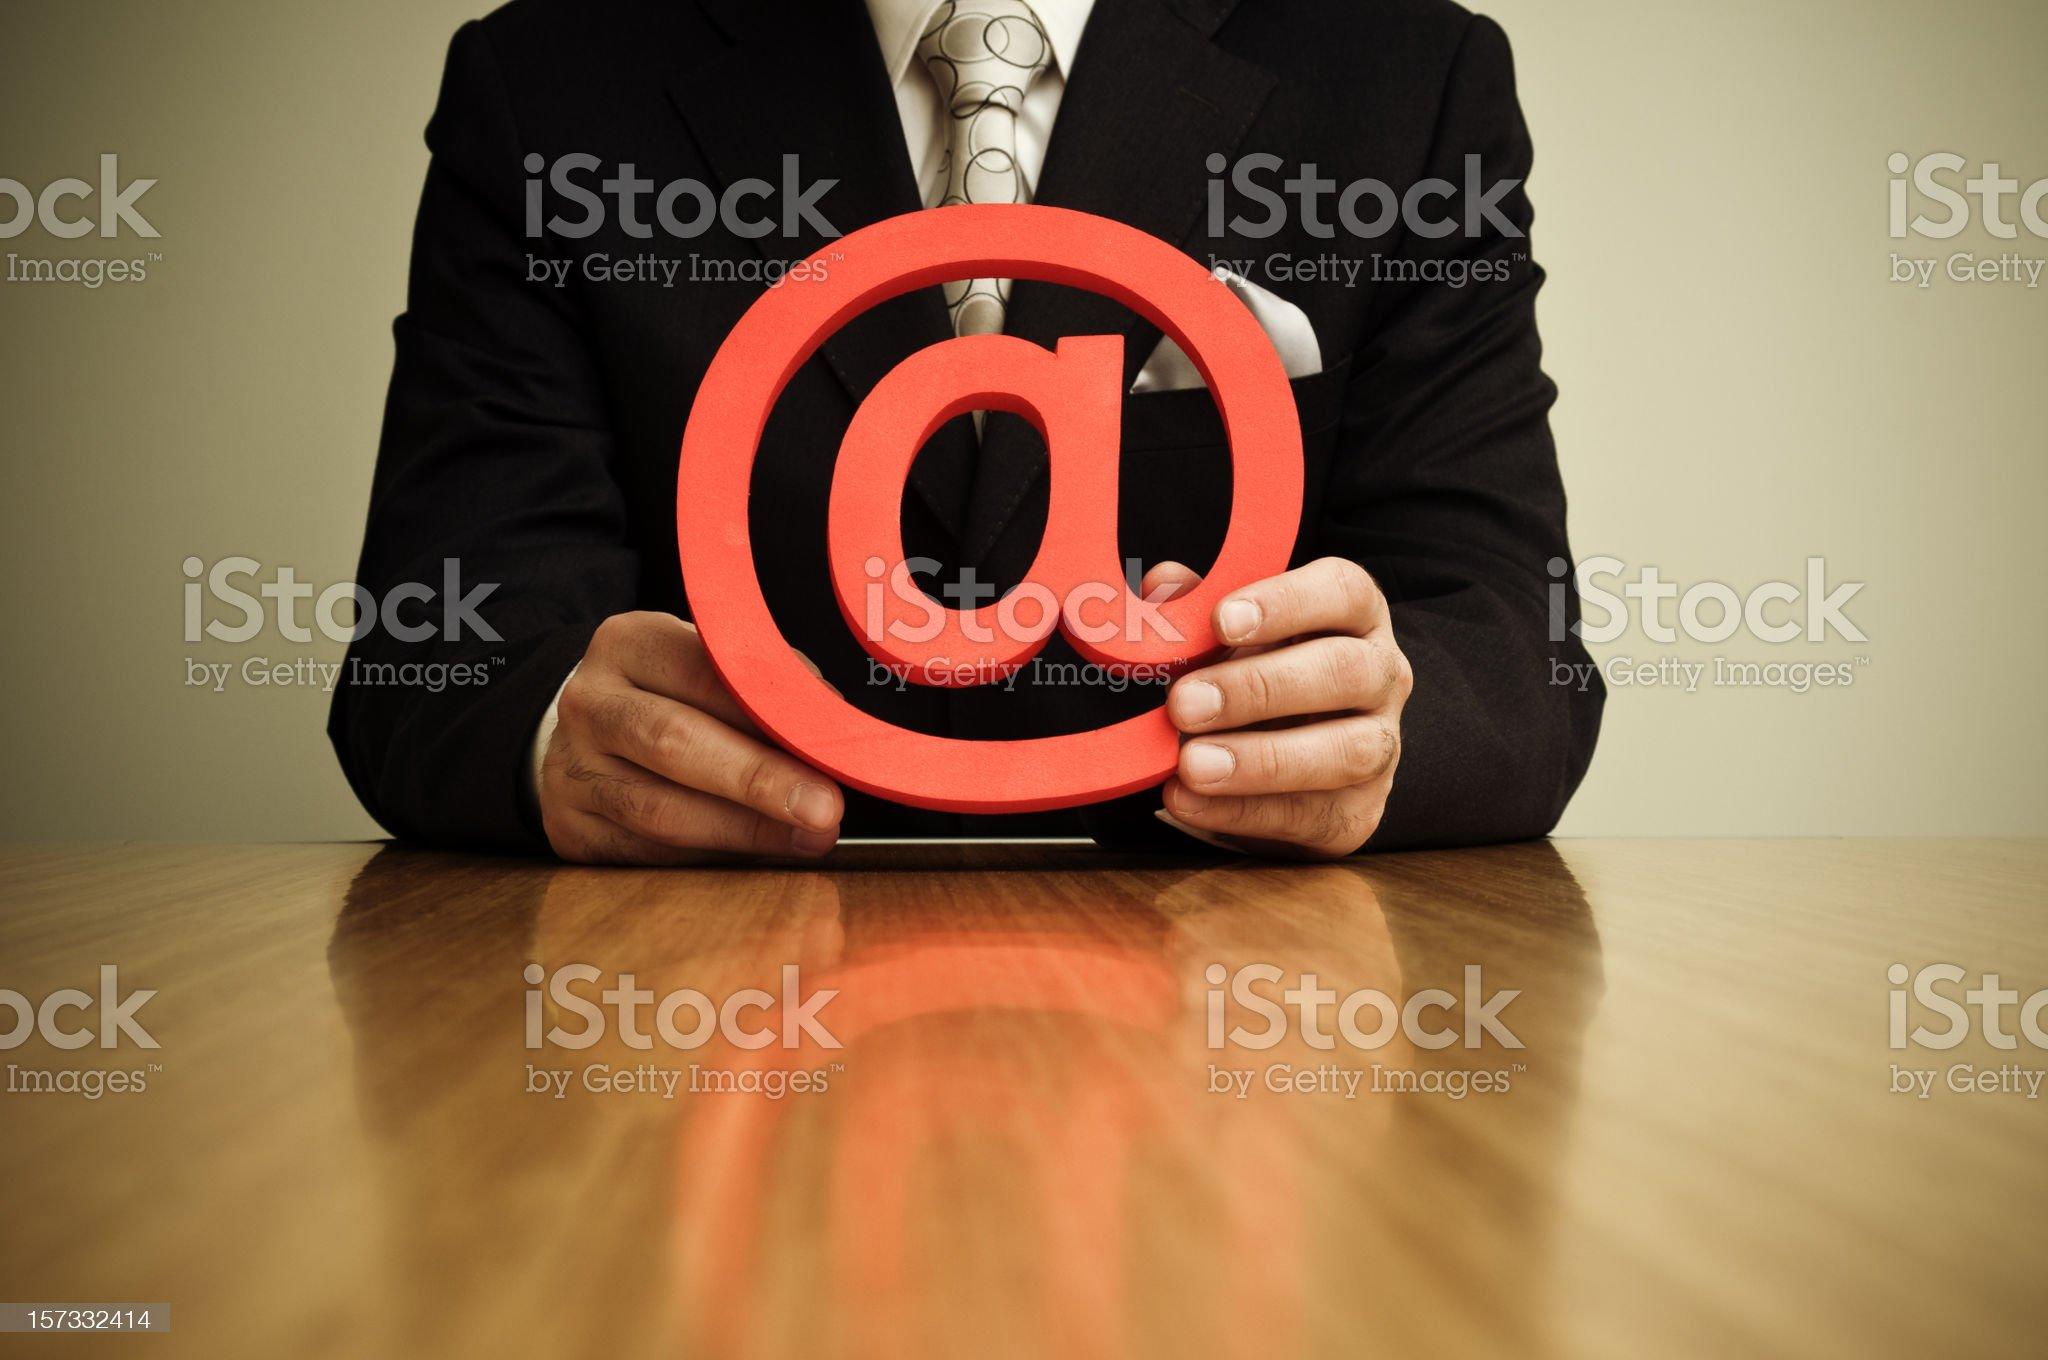 Holding an 'at' symbol royalty-free stock photo